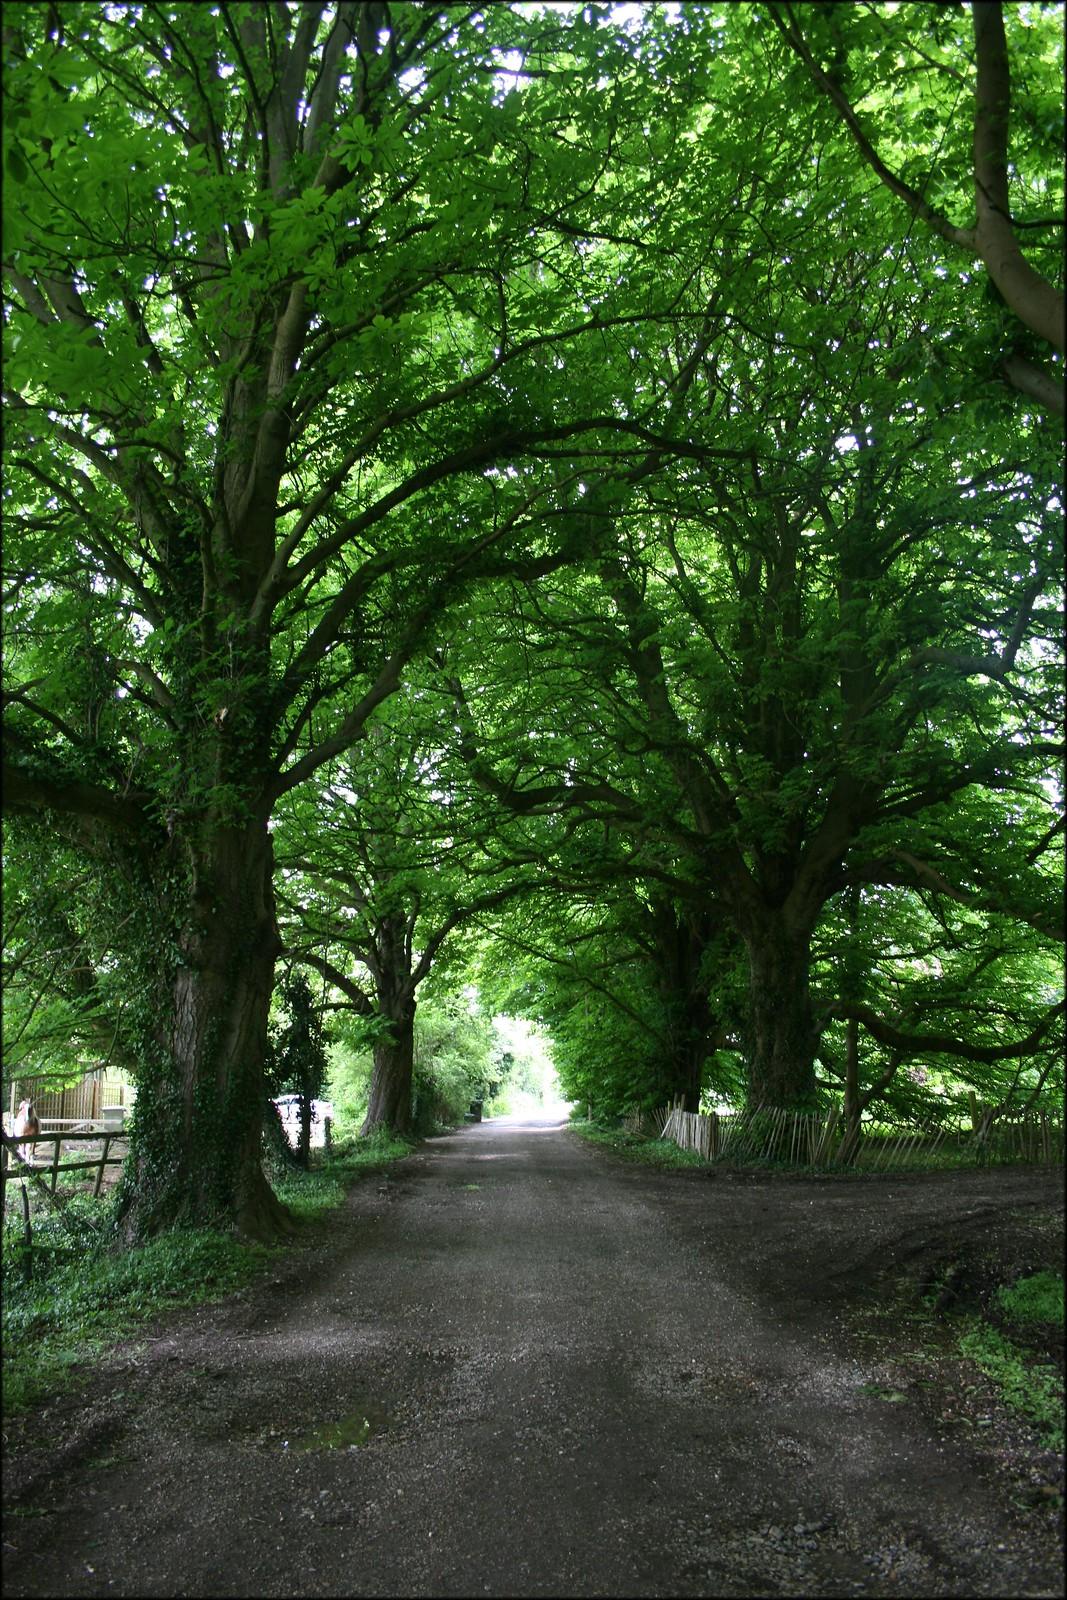 Wooded track near Aldermaston